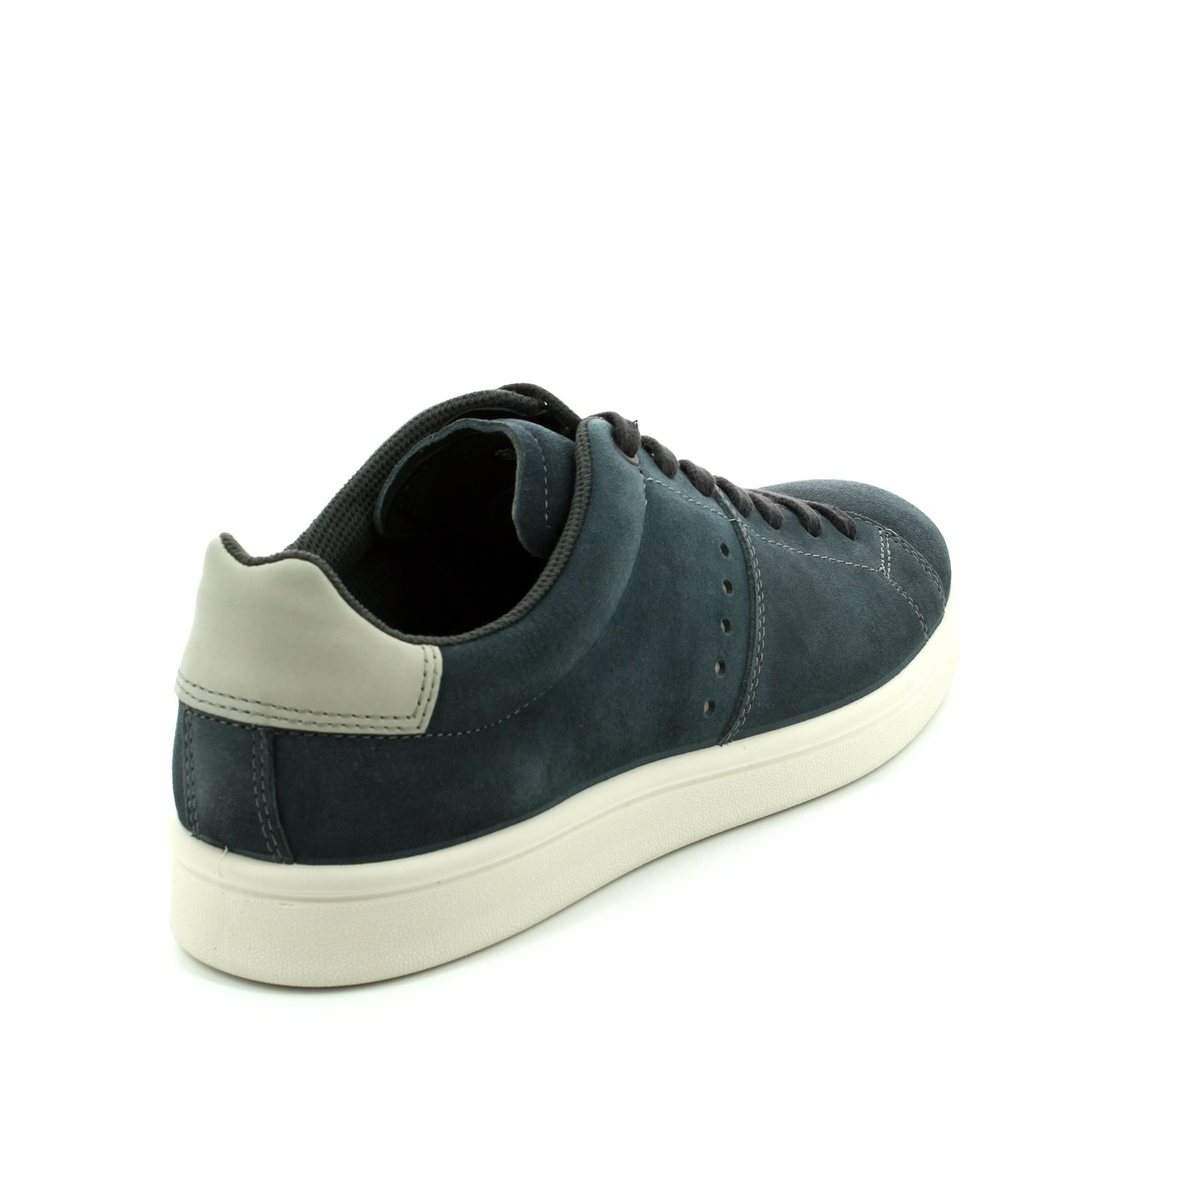 deeb45341cc4 ECCO Casual Shoes - Grey - 536604 50509 KALLUM